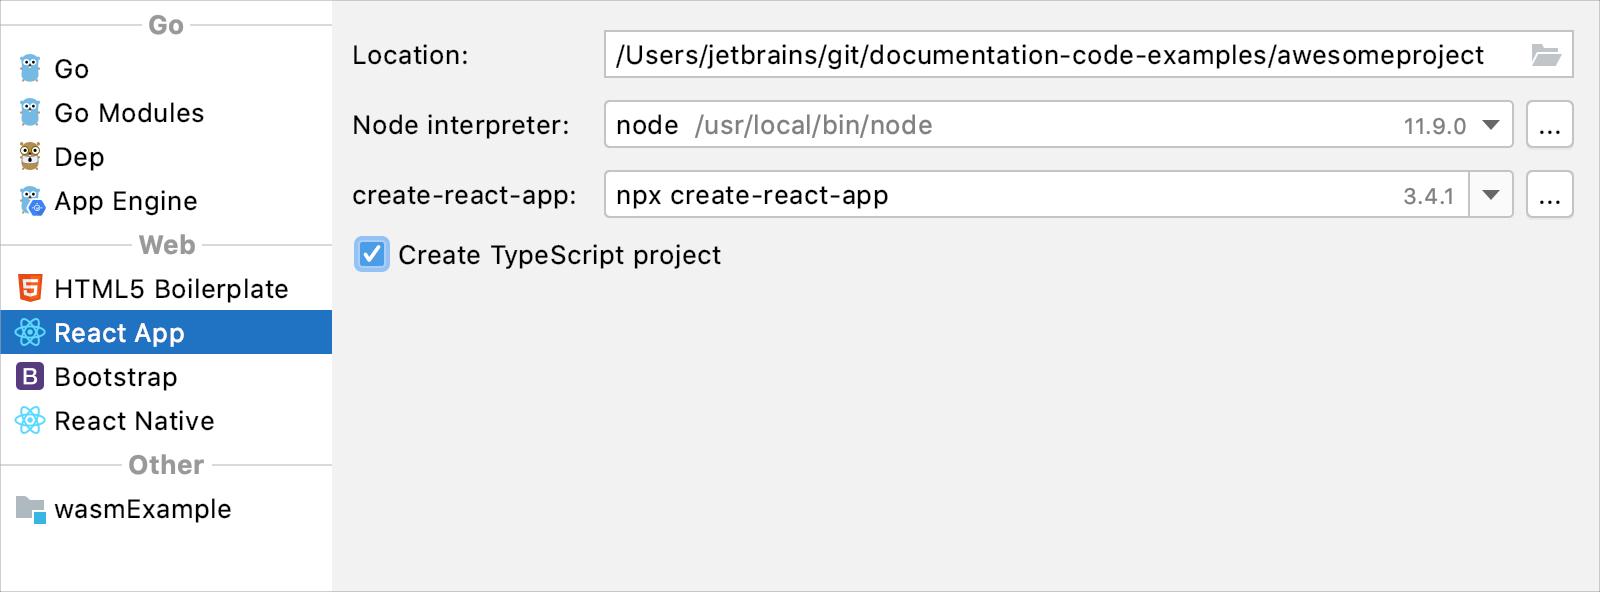 Create a React app project